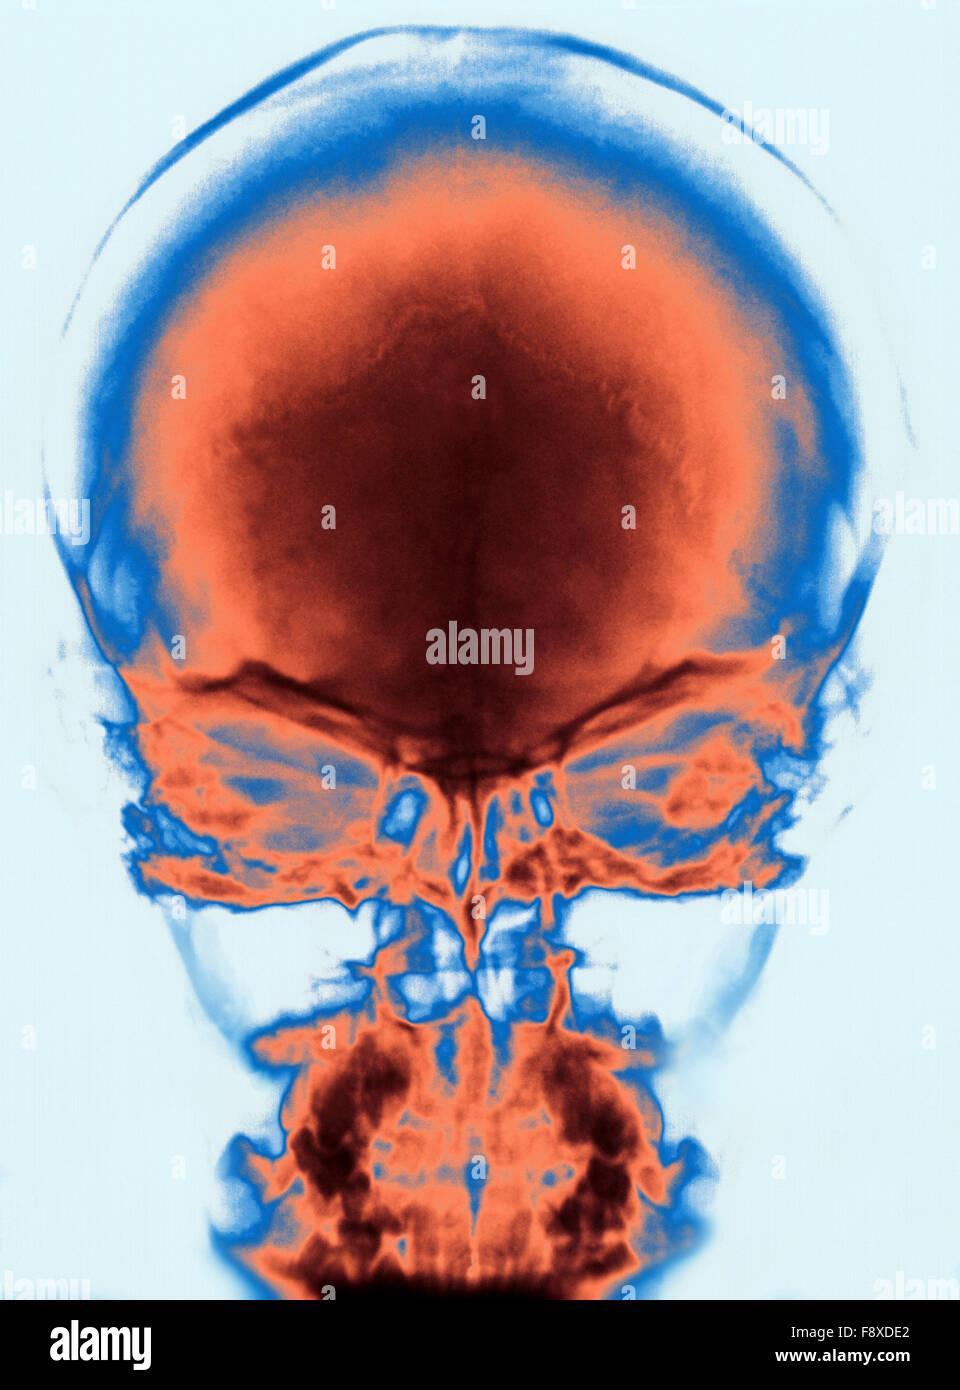 X Ray of Human Skull - Stock Image